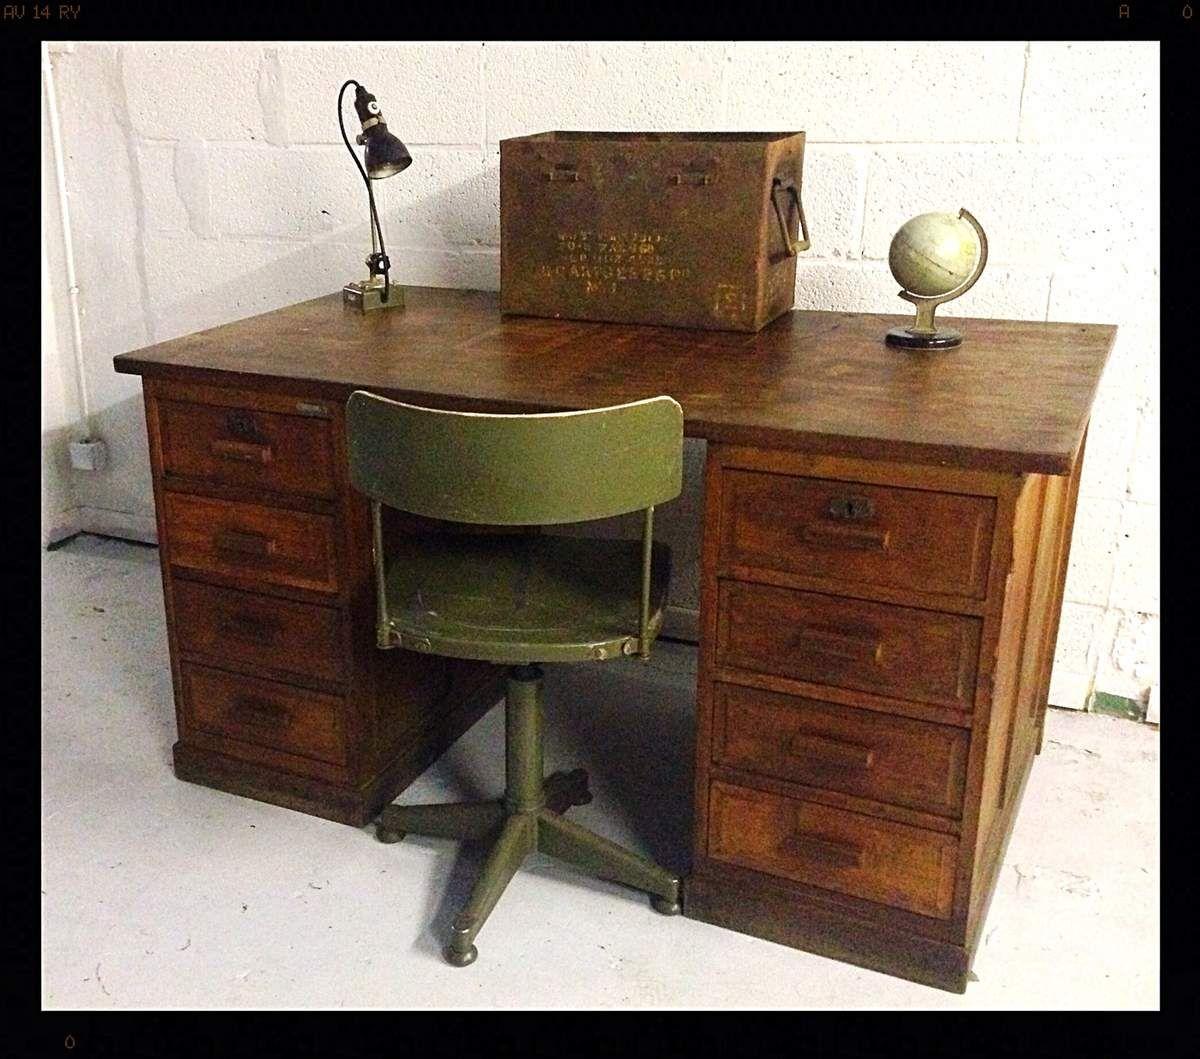 Vendu Bureau Americain Hods Design Antiques Vintage Interior Desk Office Desk